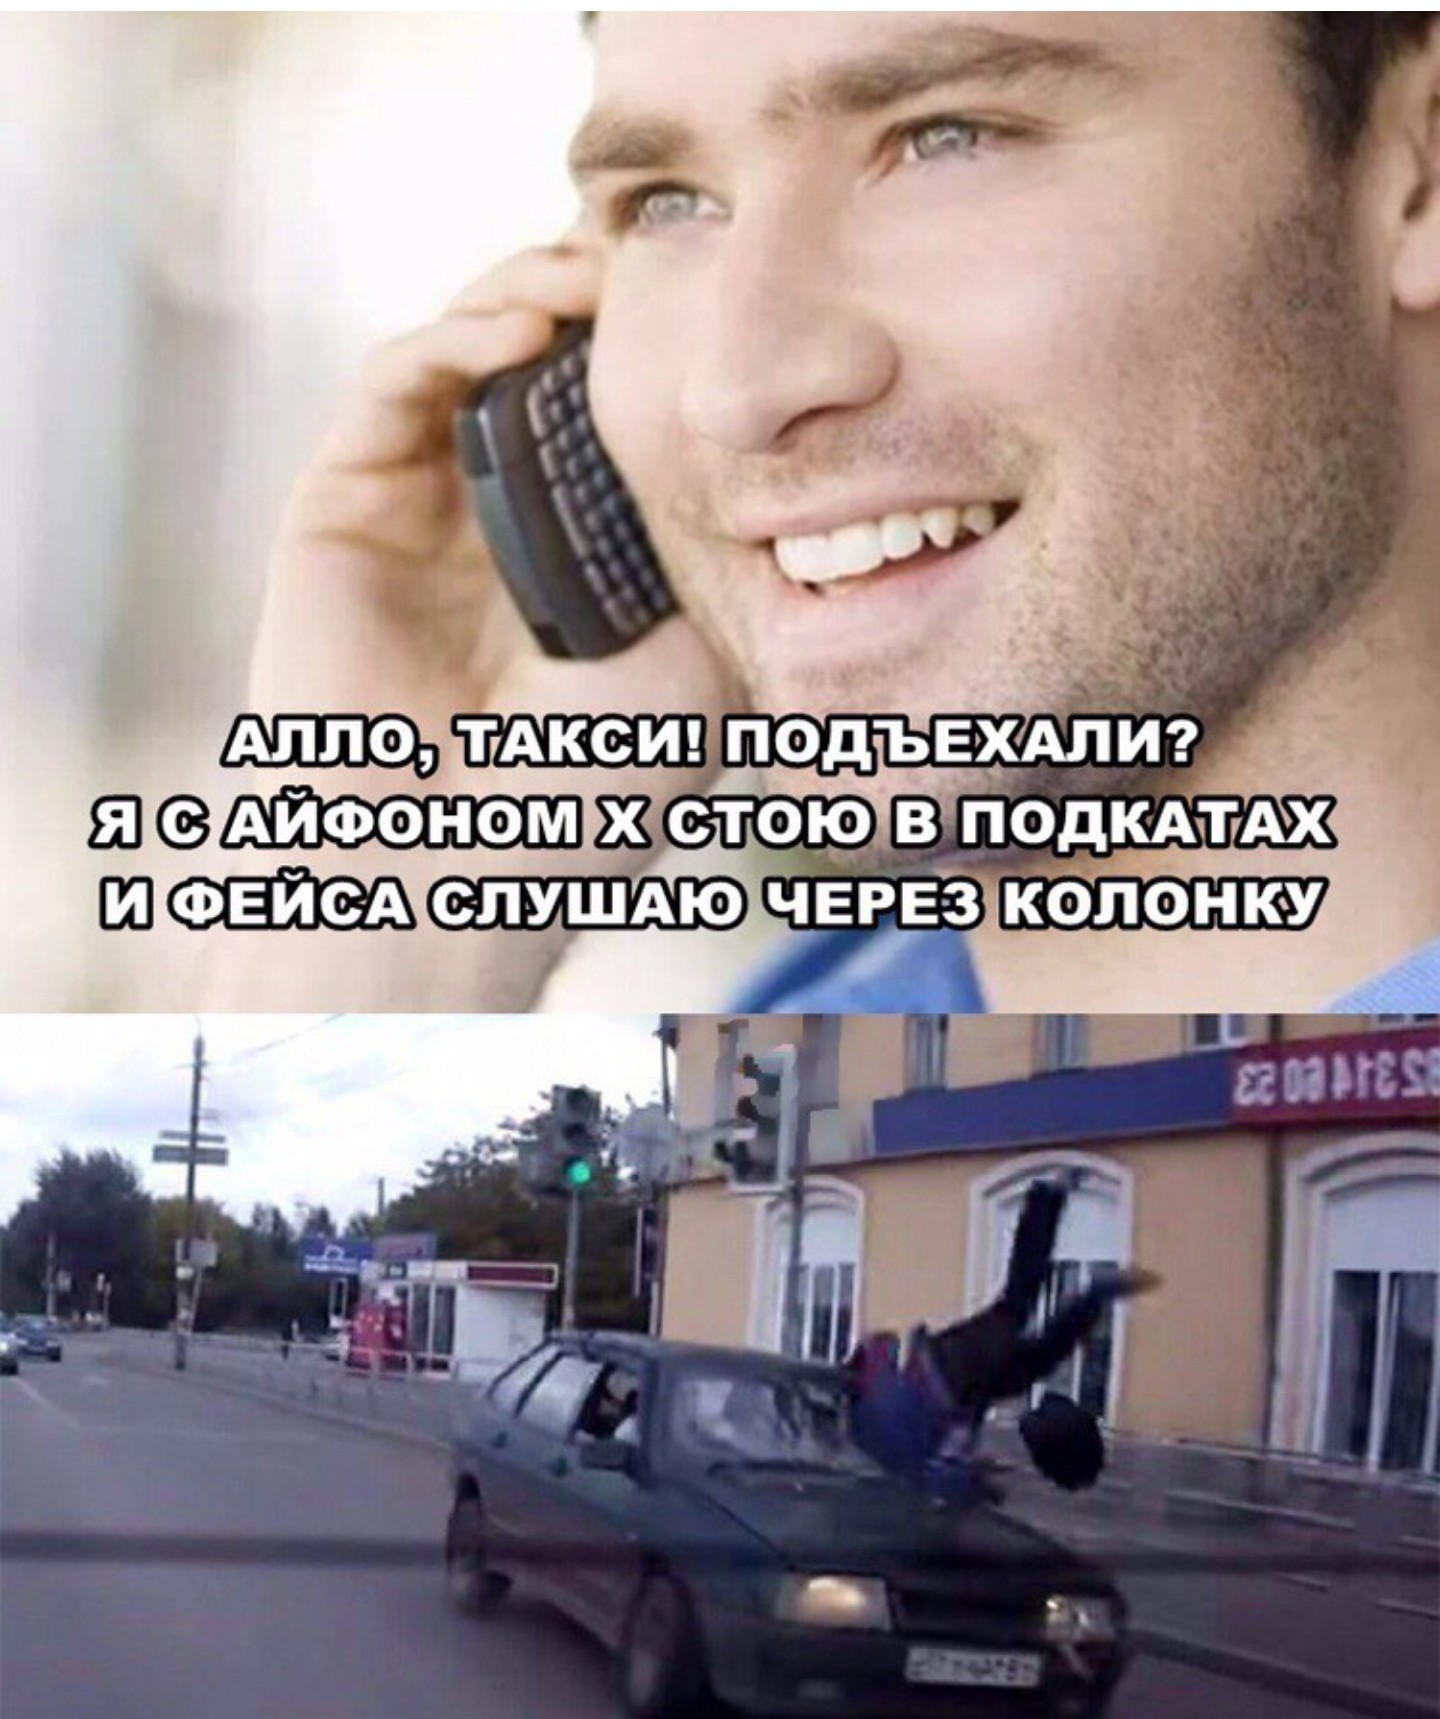 hotspotok a pikkelysmr kezelsre)